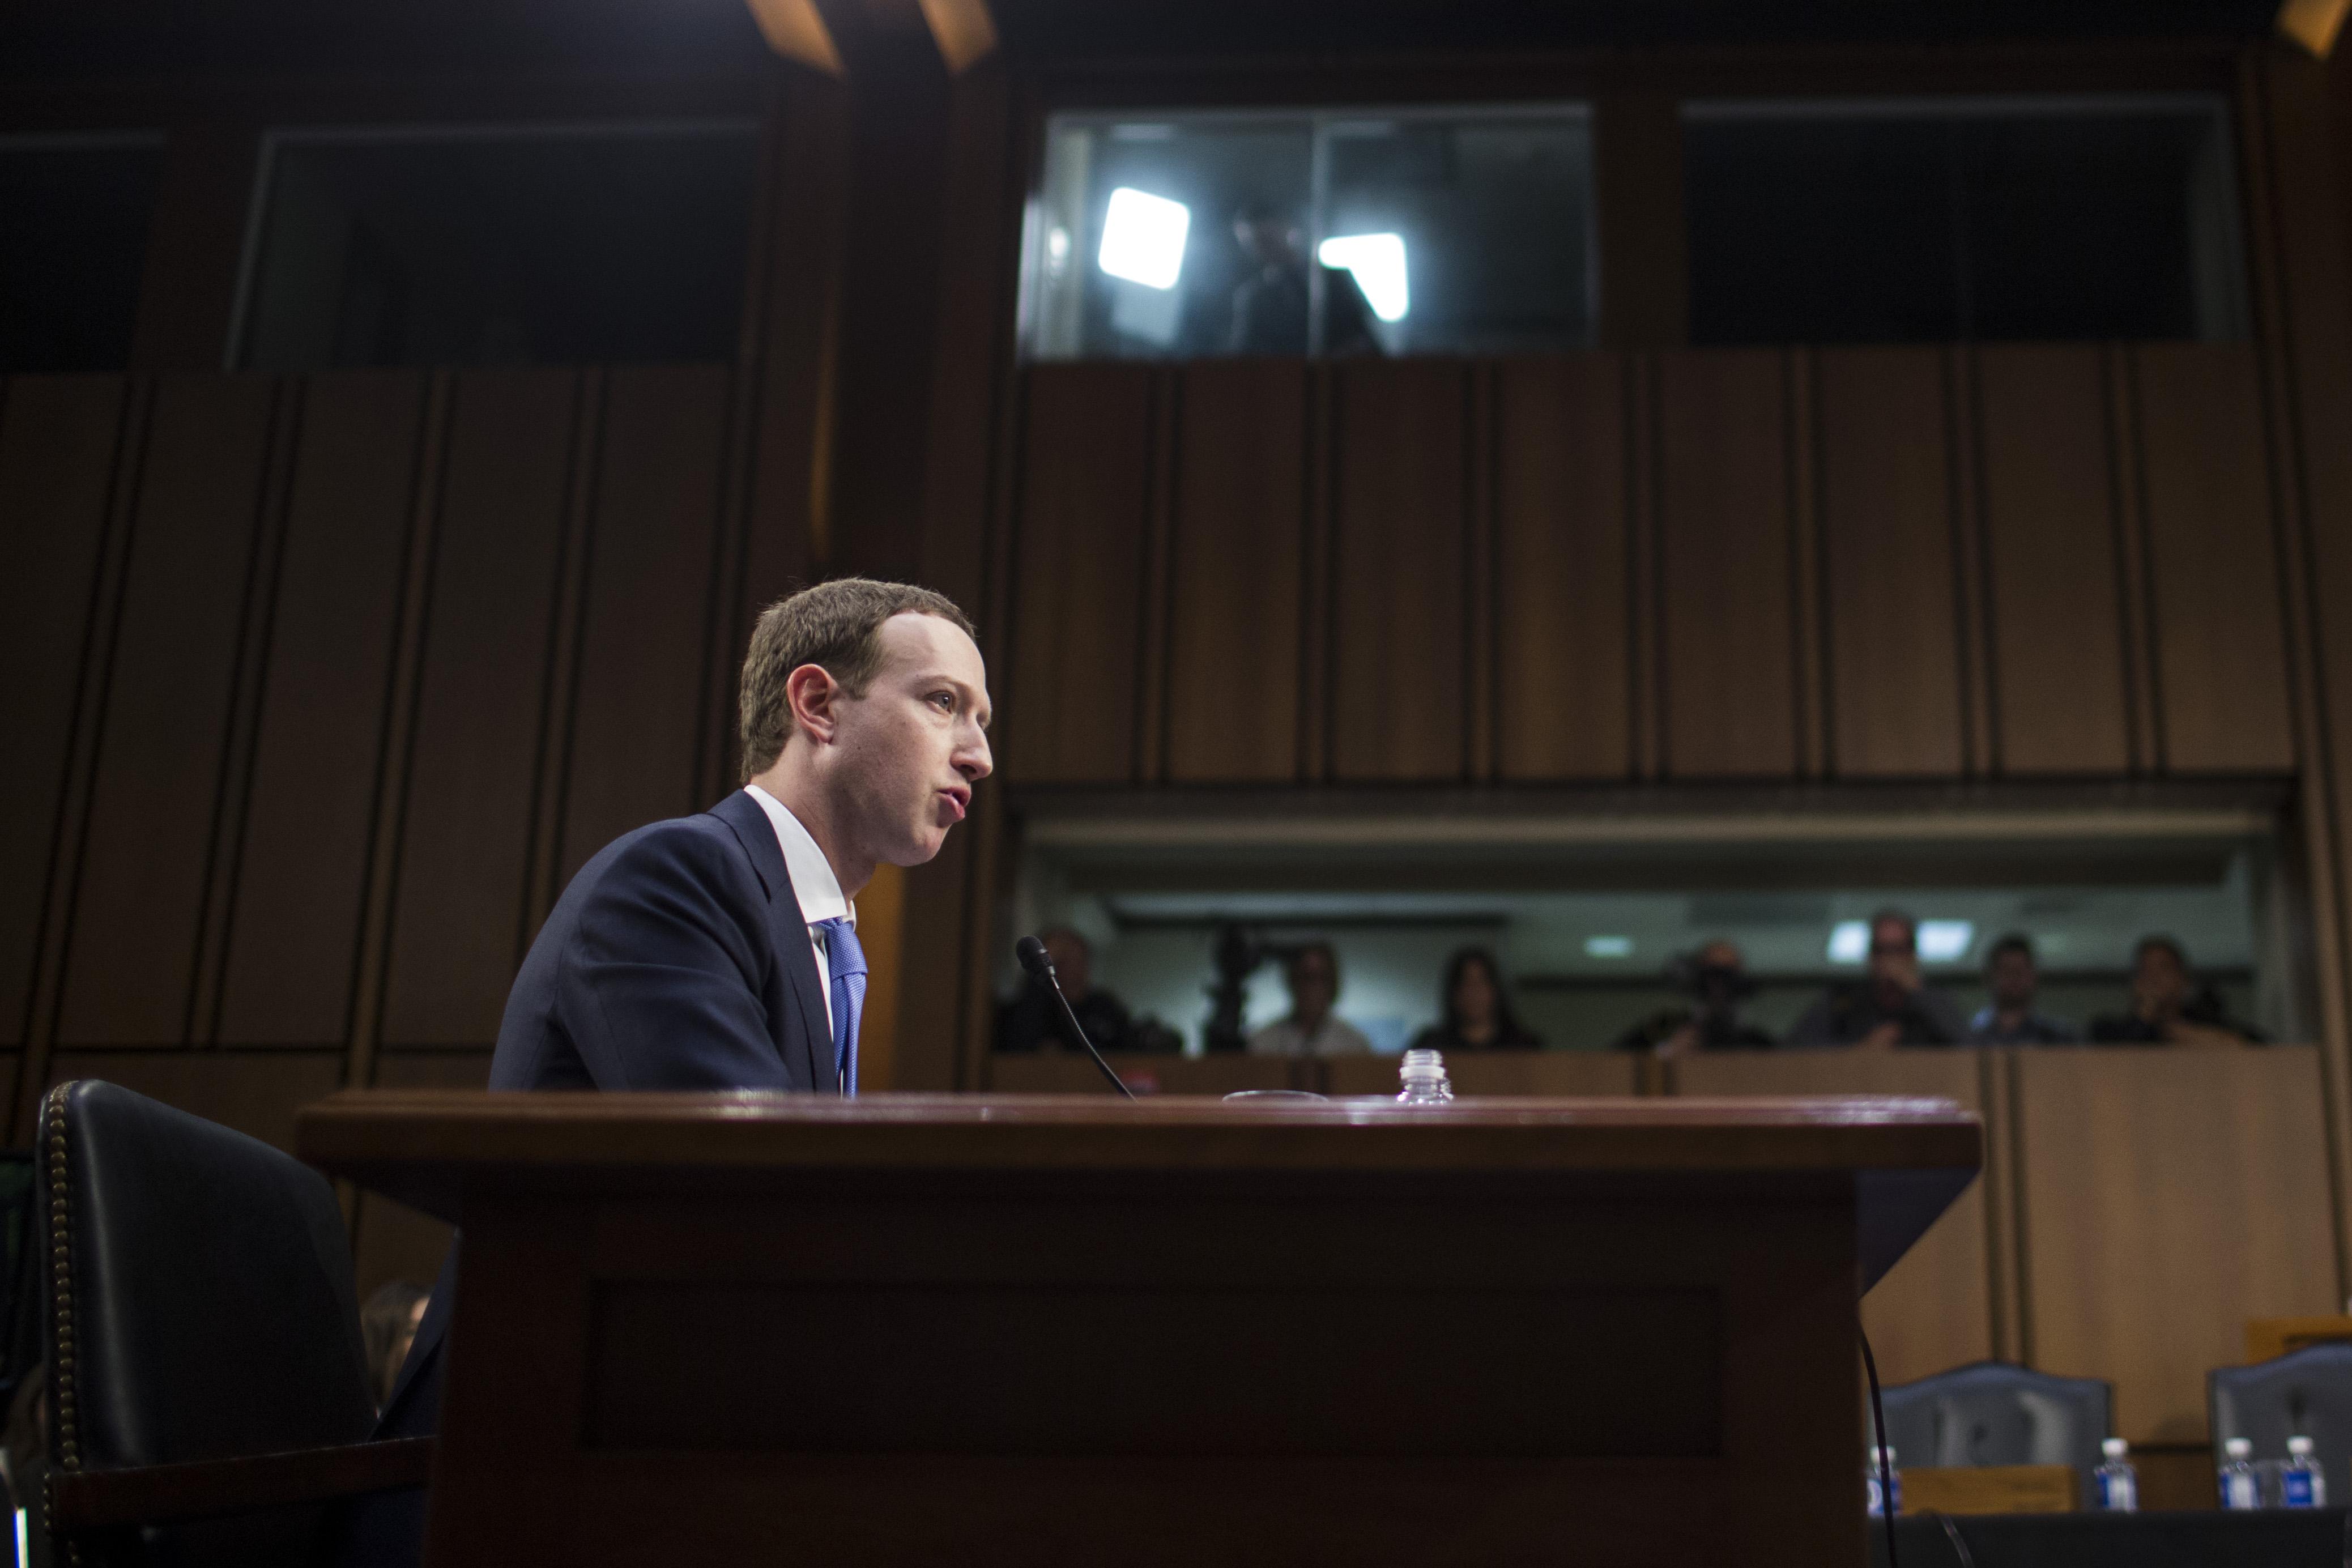 Watch Mark Zuckerberg's slightly contentious meeting with EU regulators  about Facebook's data practices